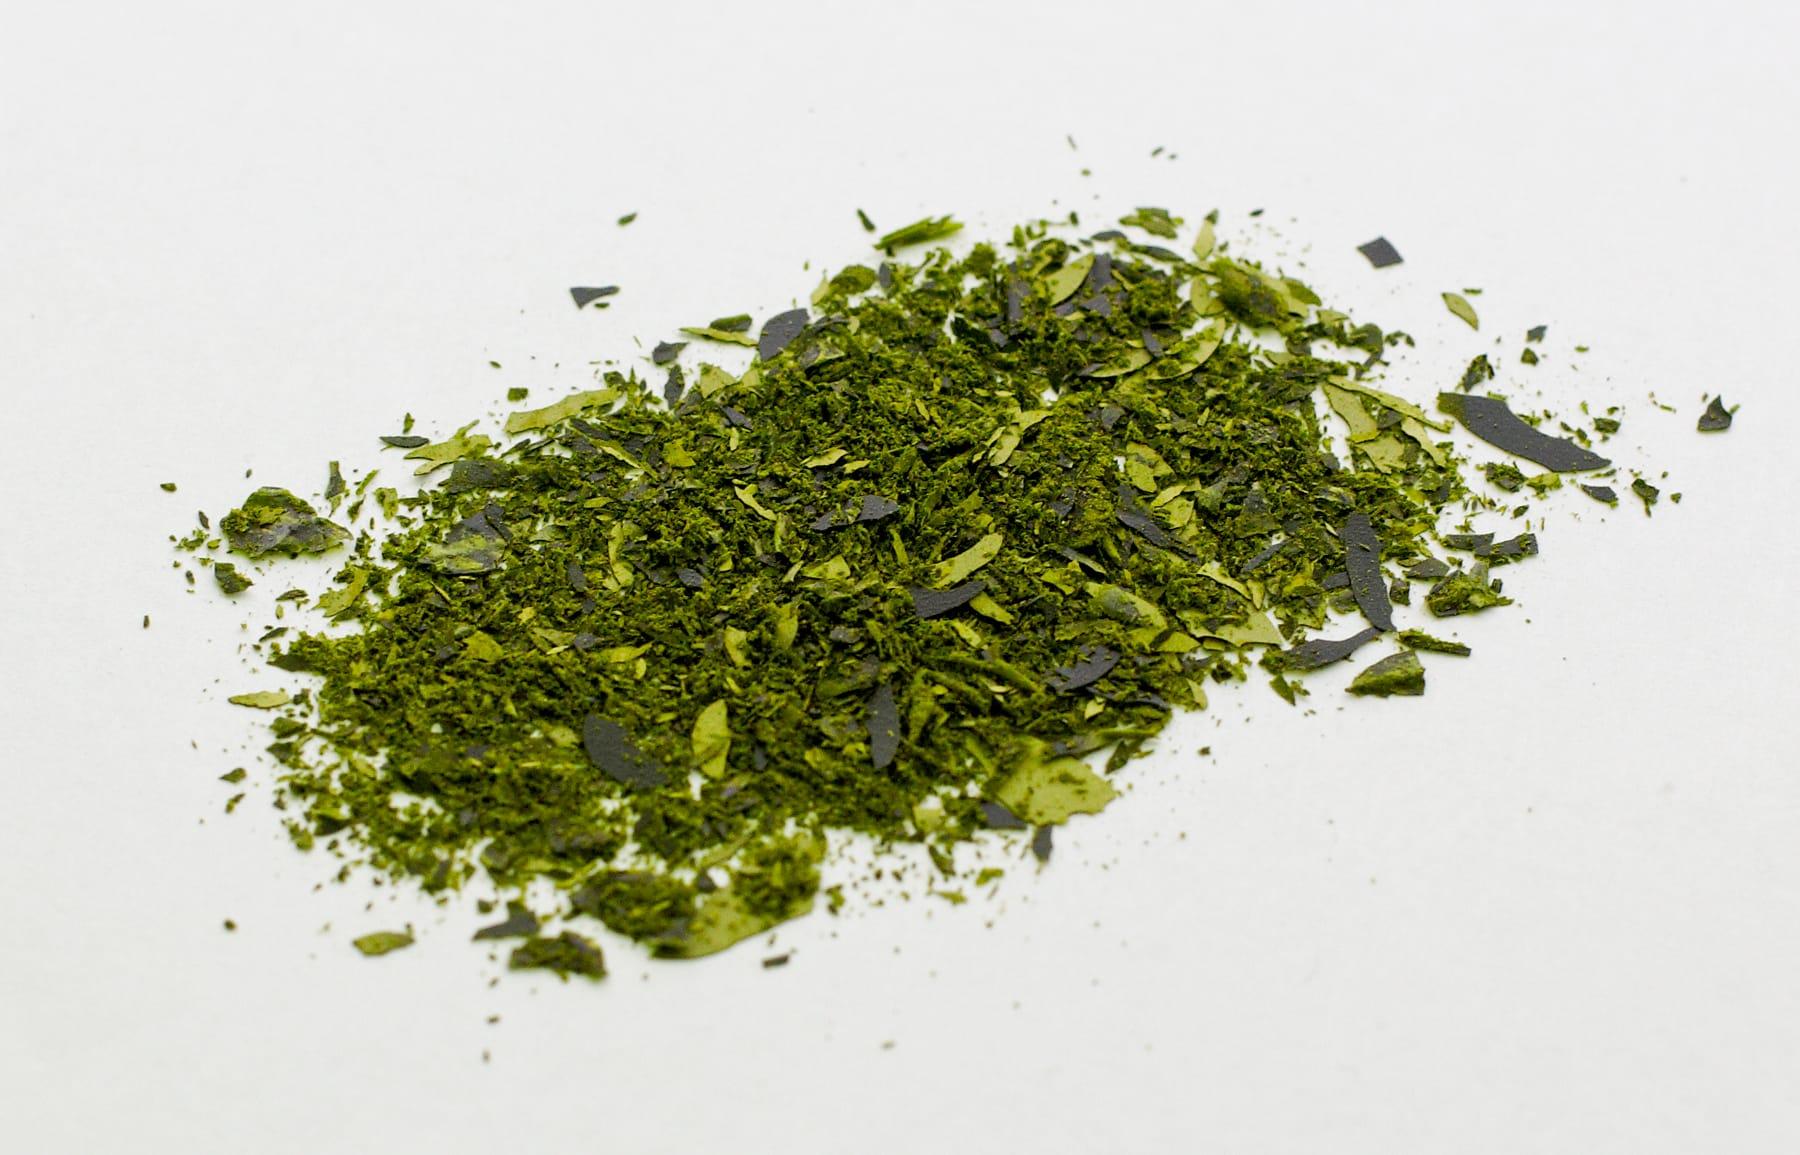 olika sorters alger